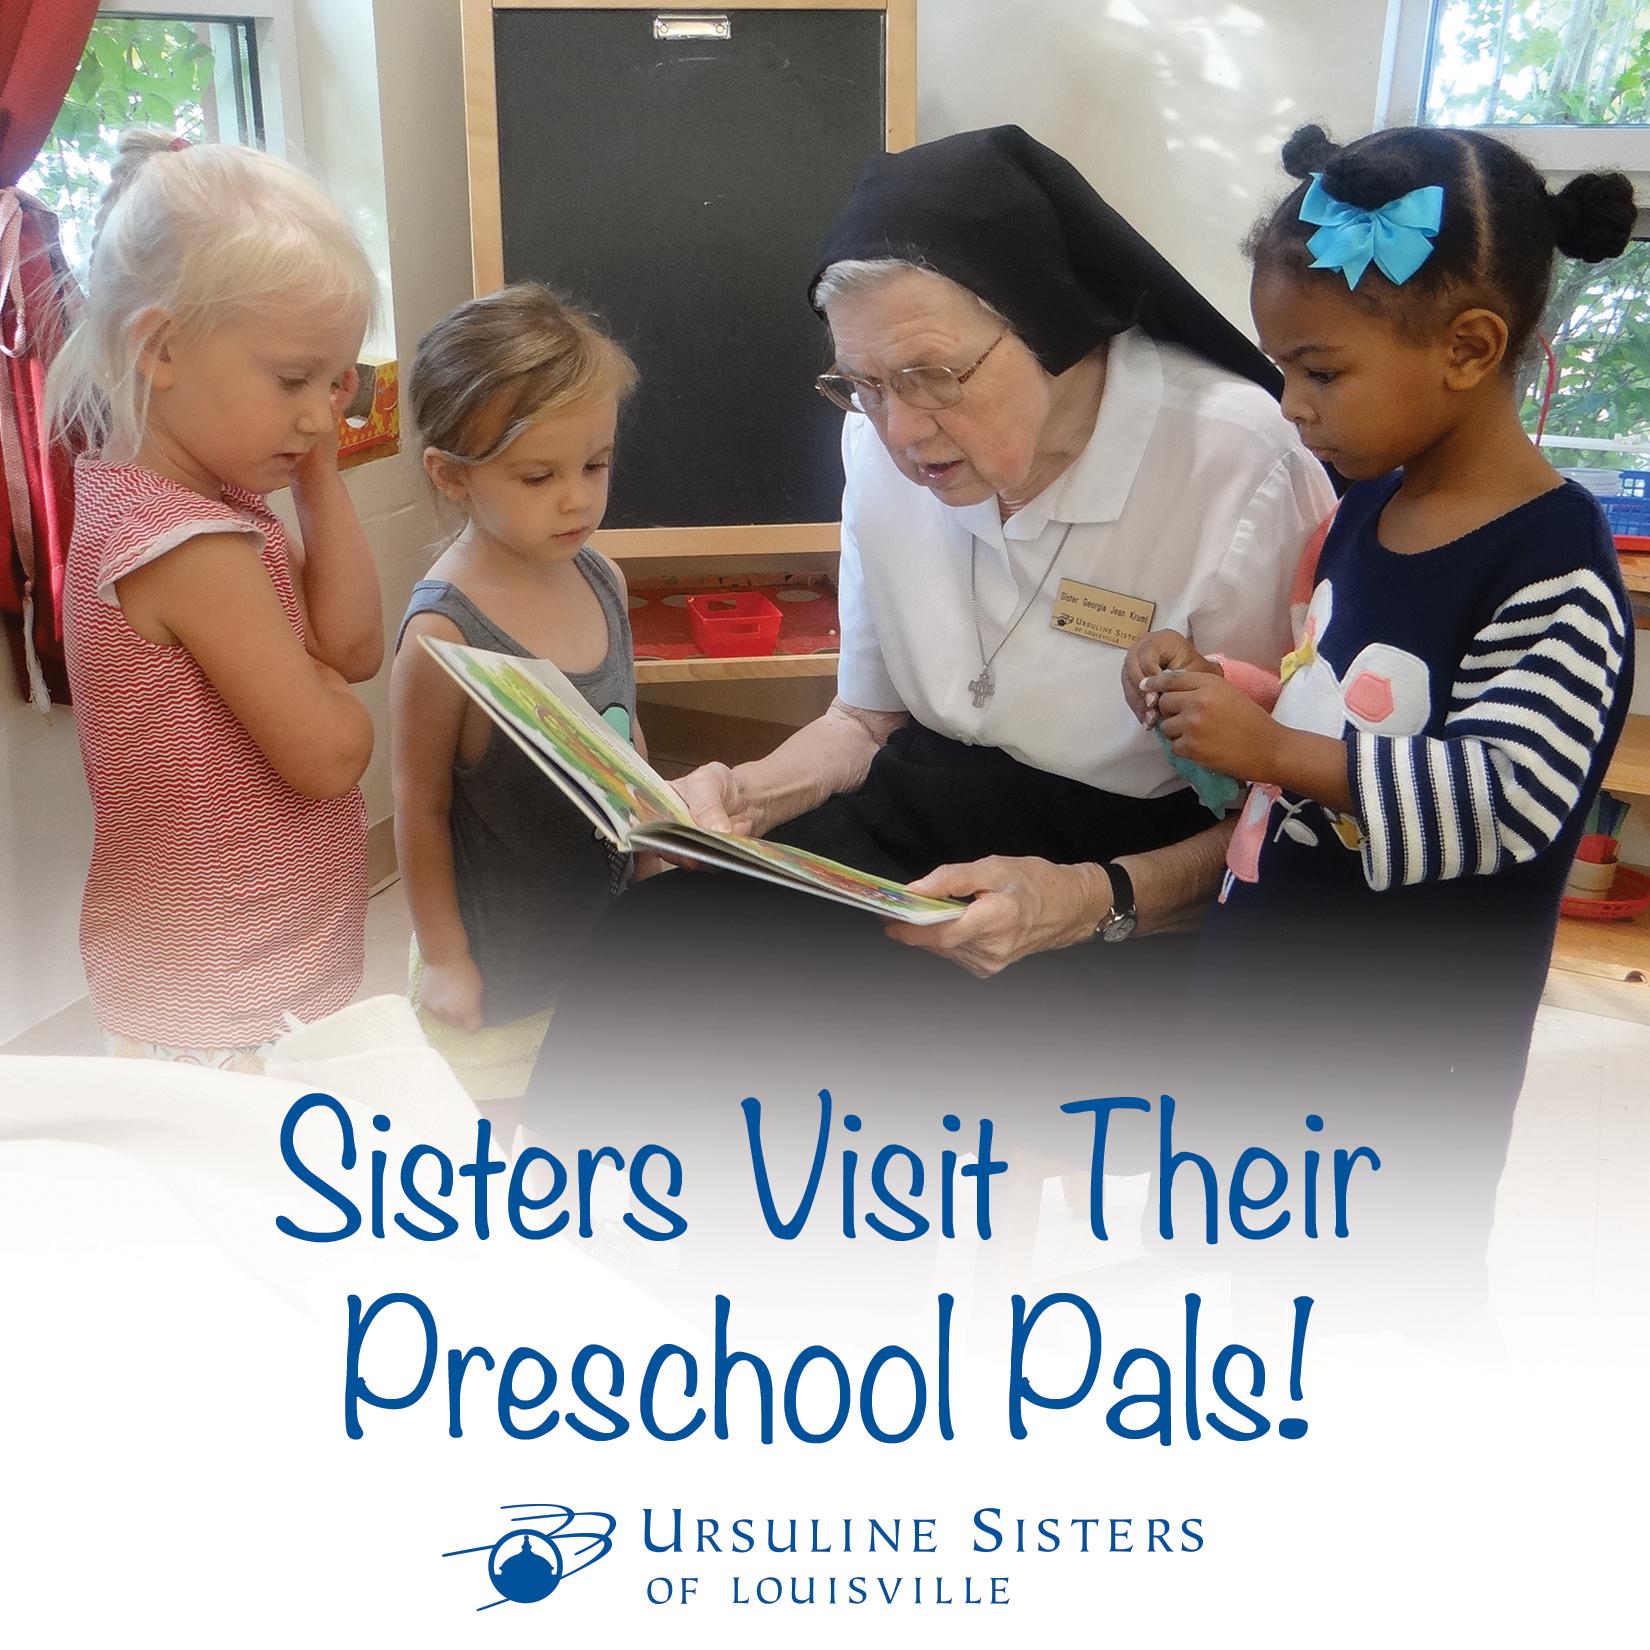 Ursuline Sisters of Louisville